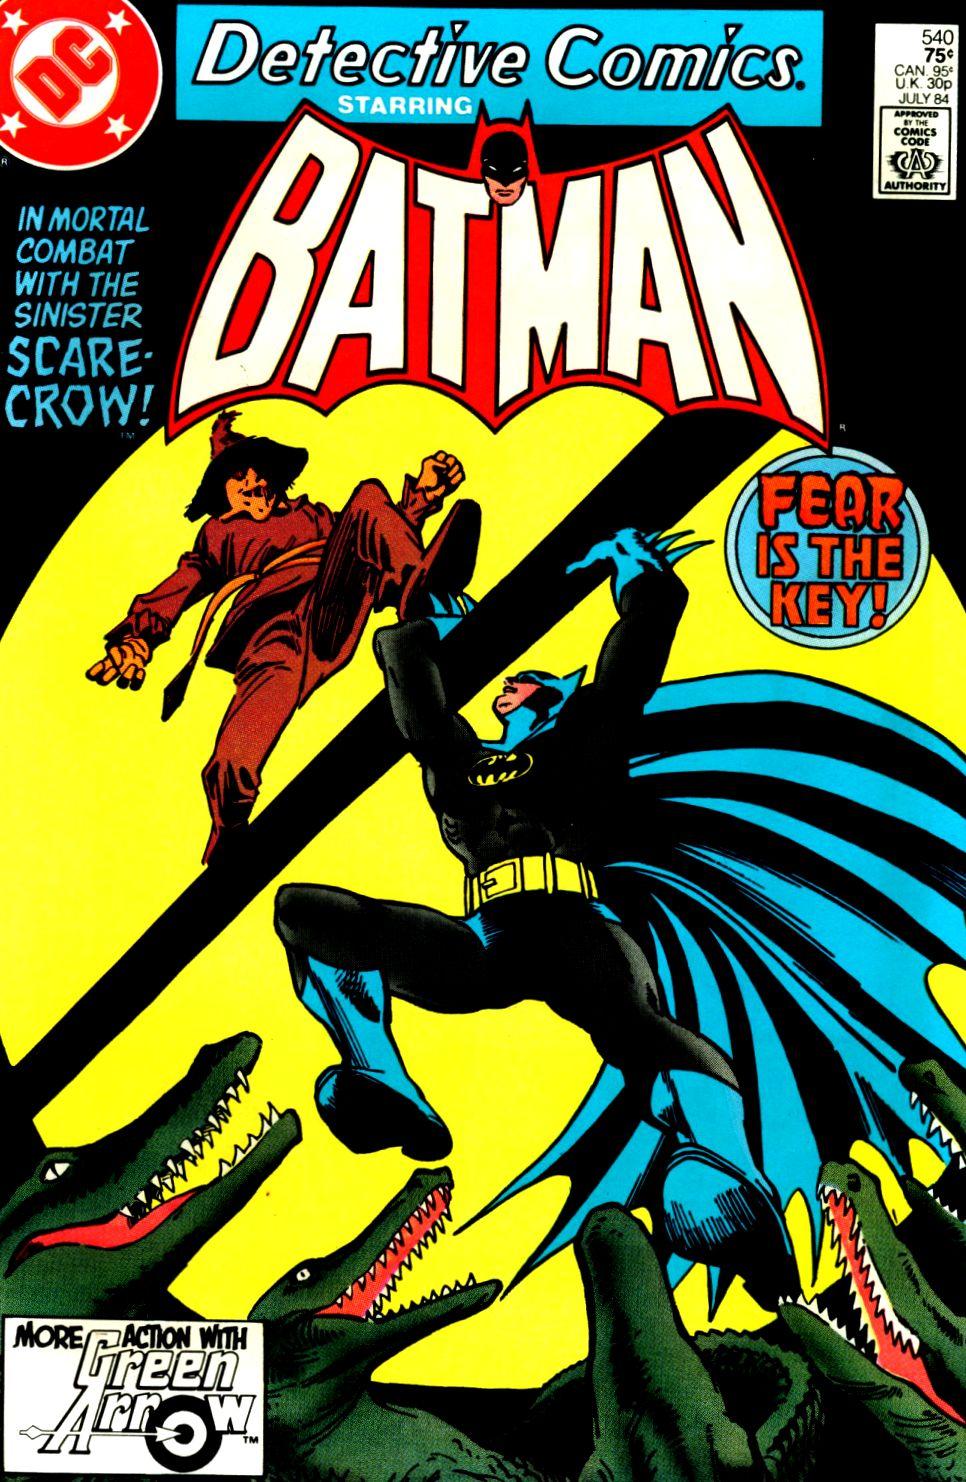 Detective Comics (1937) 540 Page 1